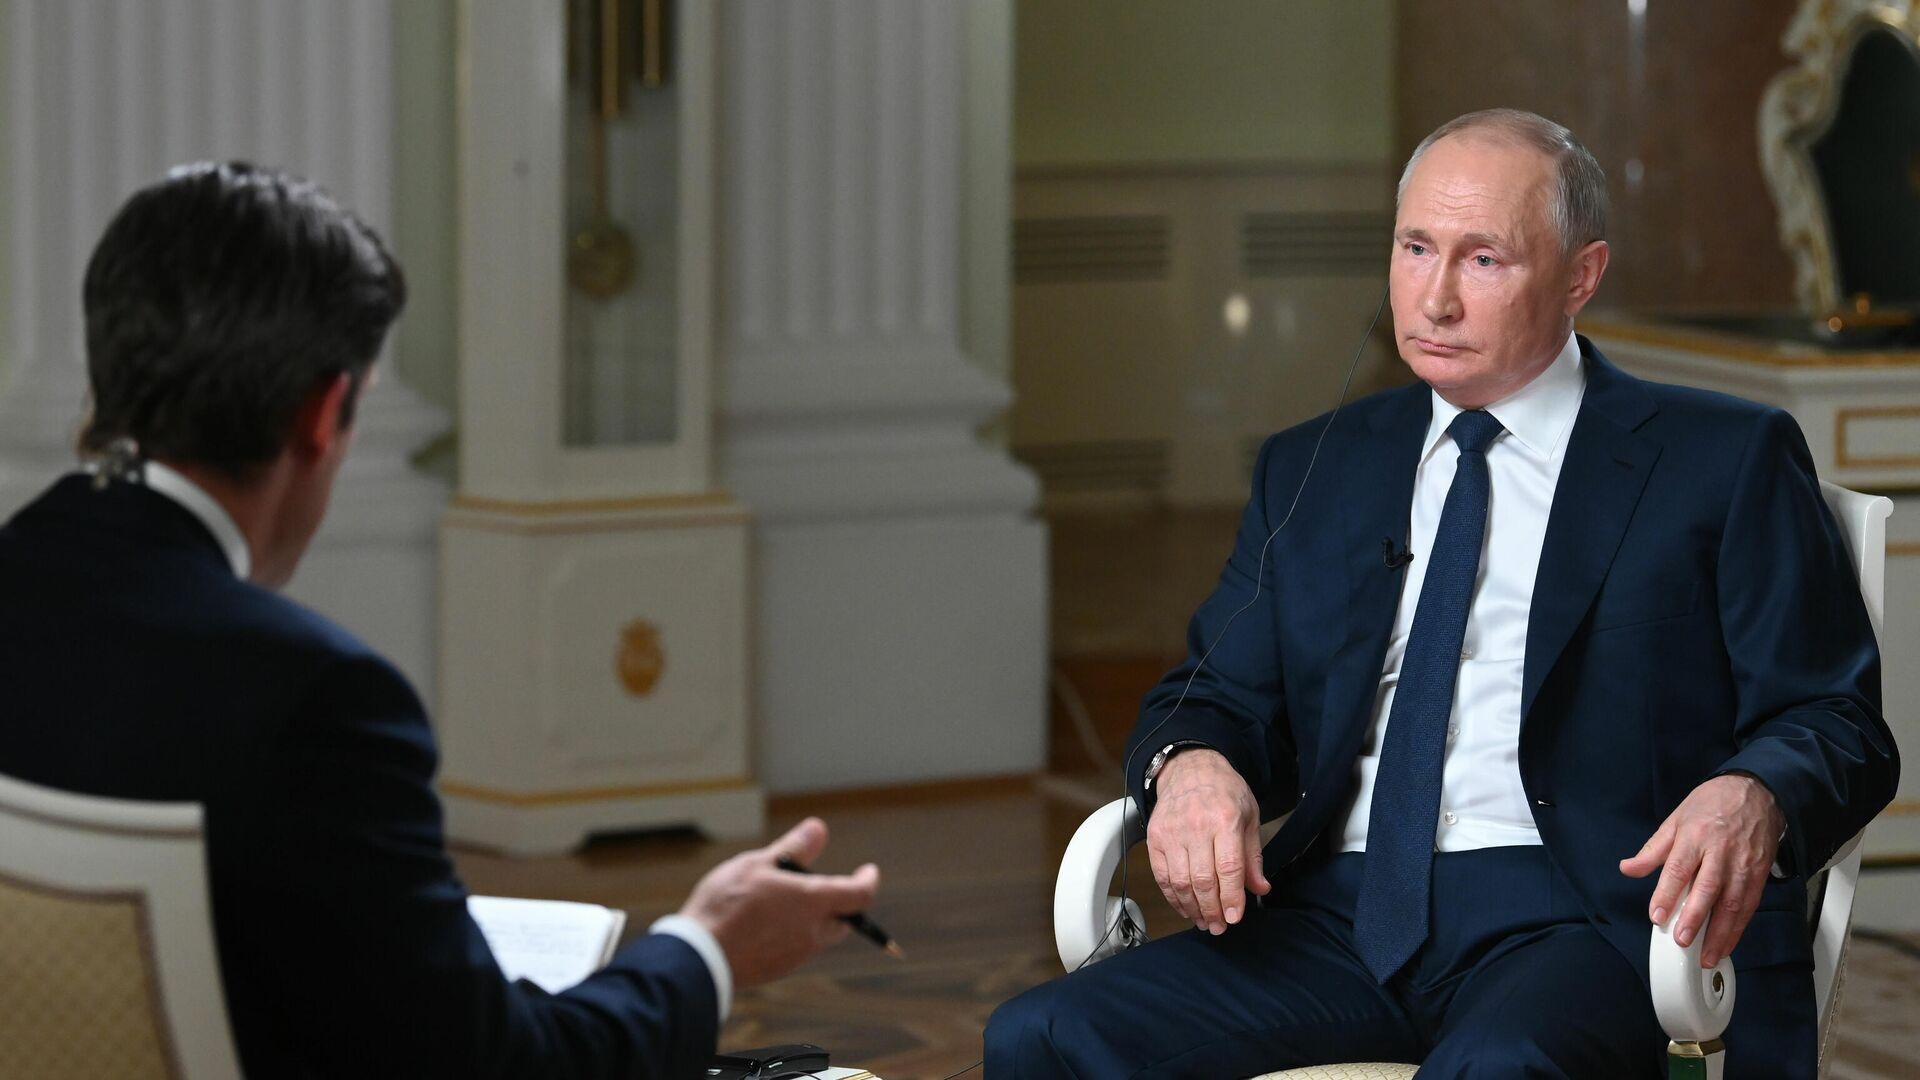 Президент РФ Владимир Путин отвечает на вопросы журналиста телекомпании NBC Кира Симмонса - РИА Новости, 1920, 15.06.2021